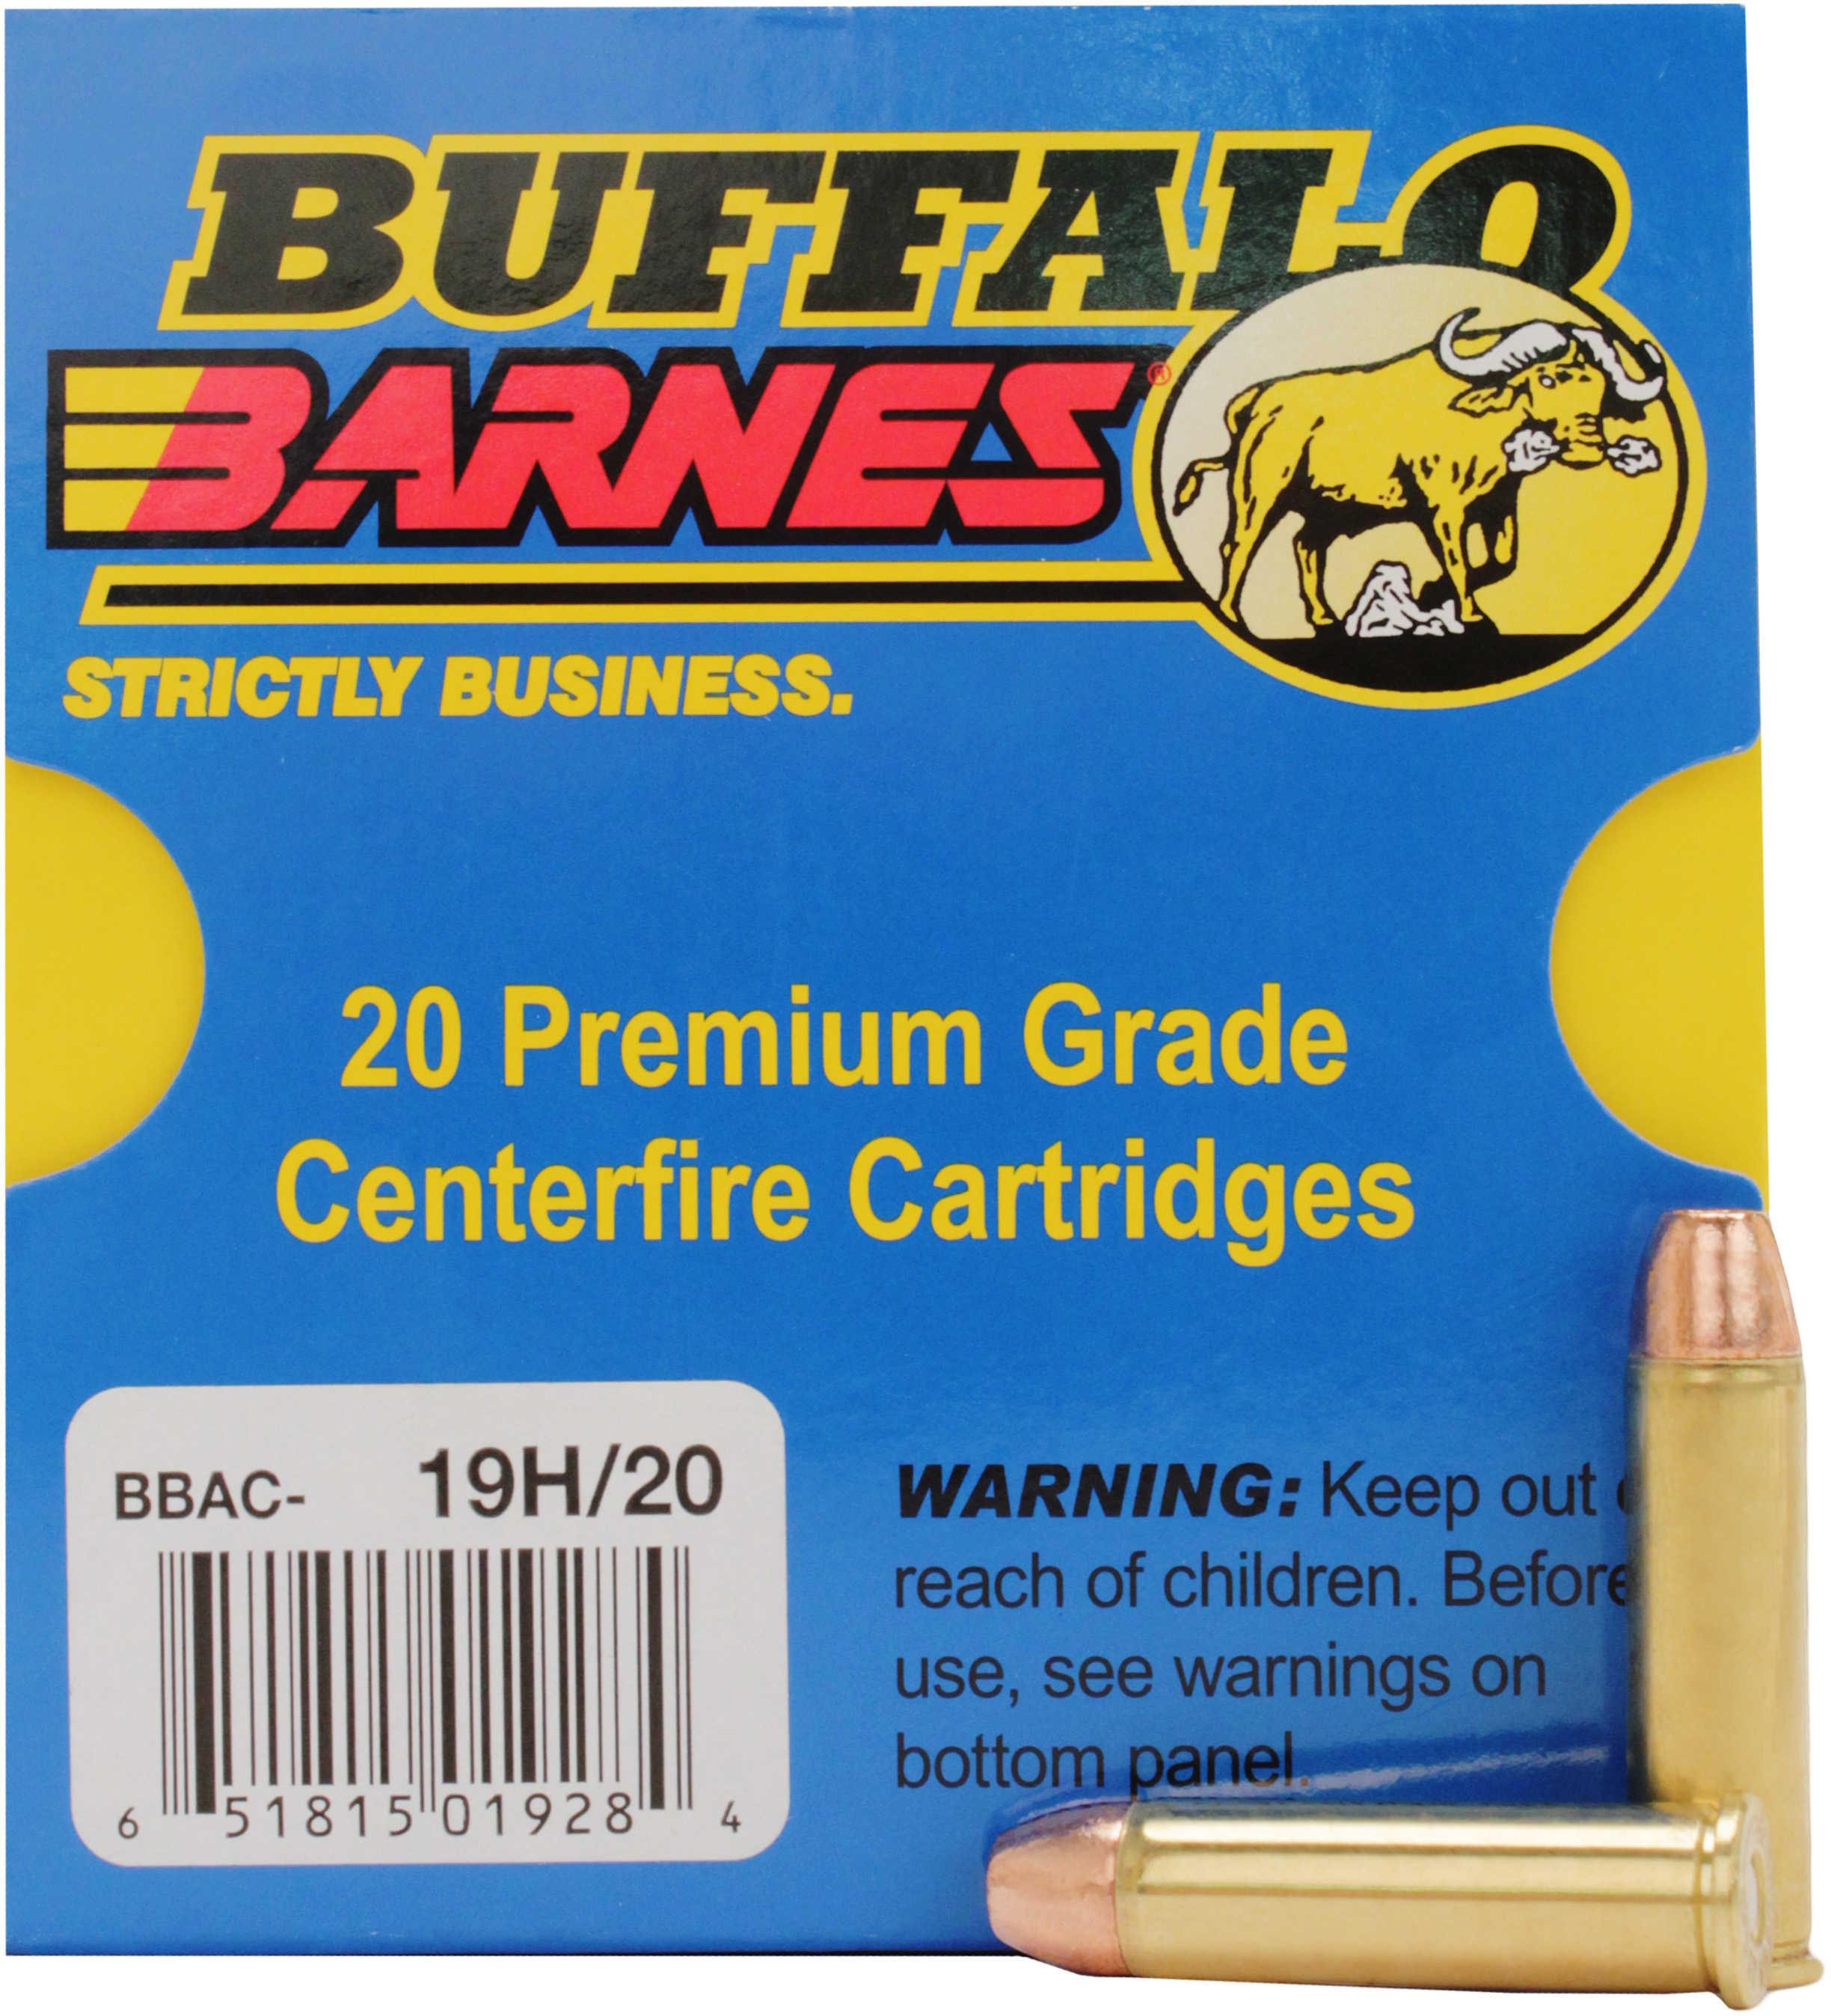 Buffalo Bore Ammunition Handgun 357 Rem Mag XPB 125 Grains 20 Rounds Per Box 19H/20